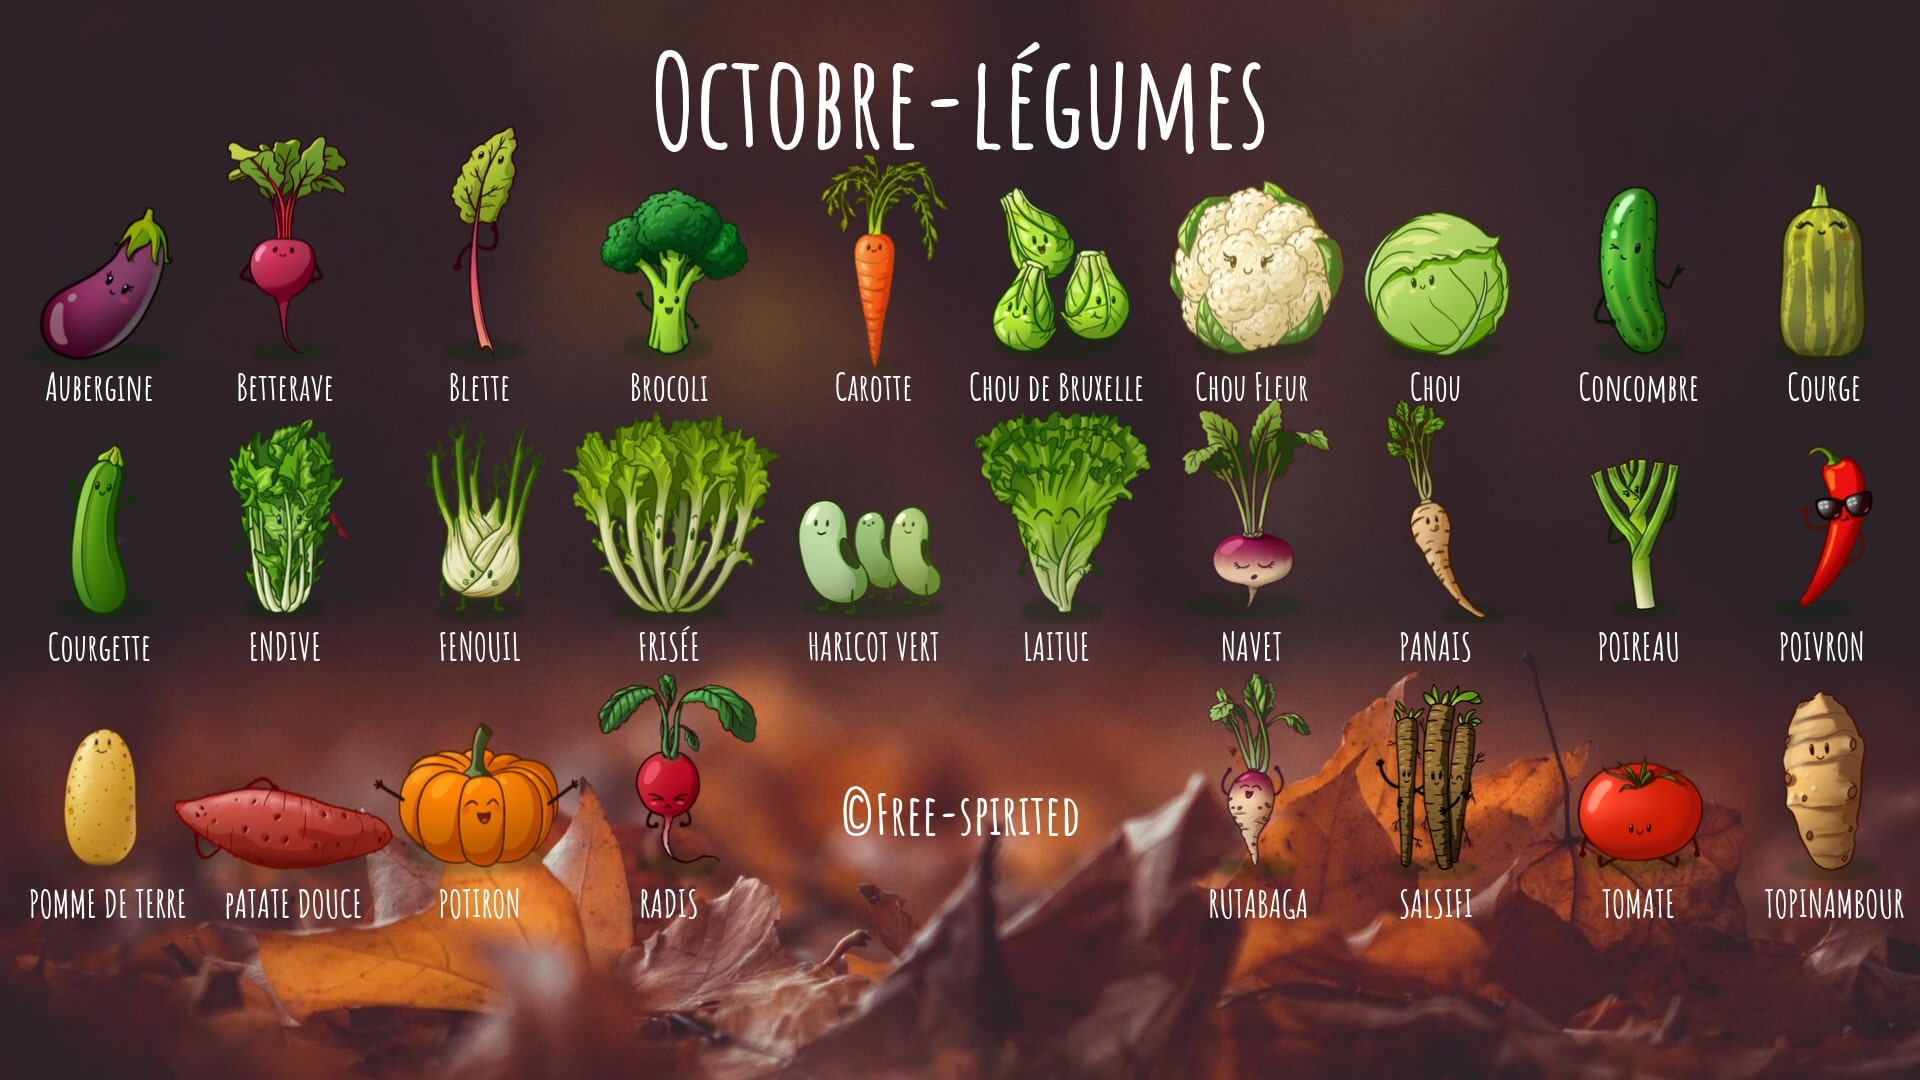 free-spirited-calendrier-légume-saison-octobre